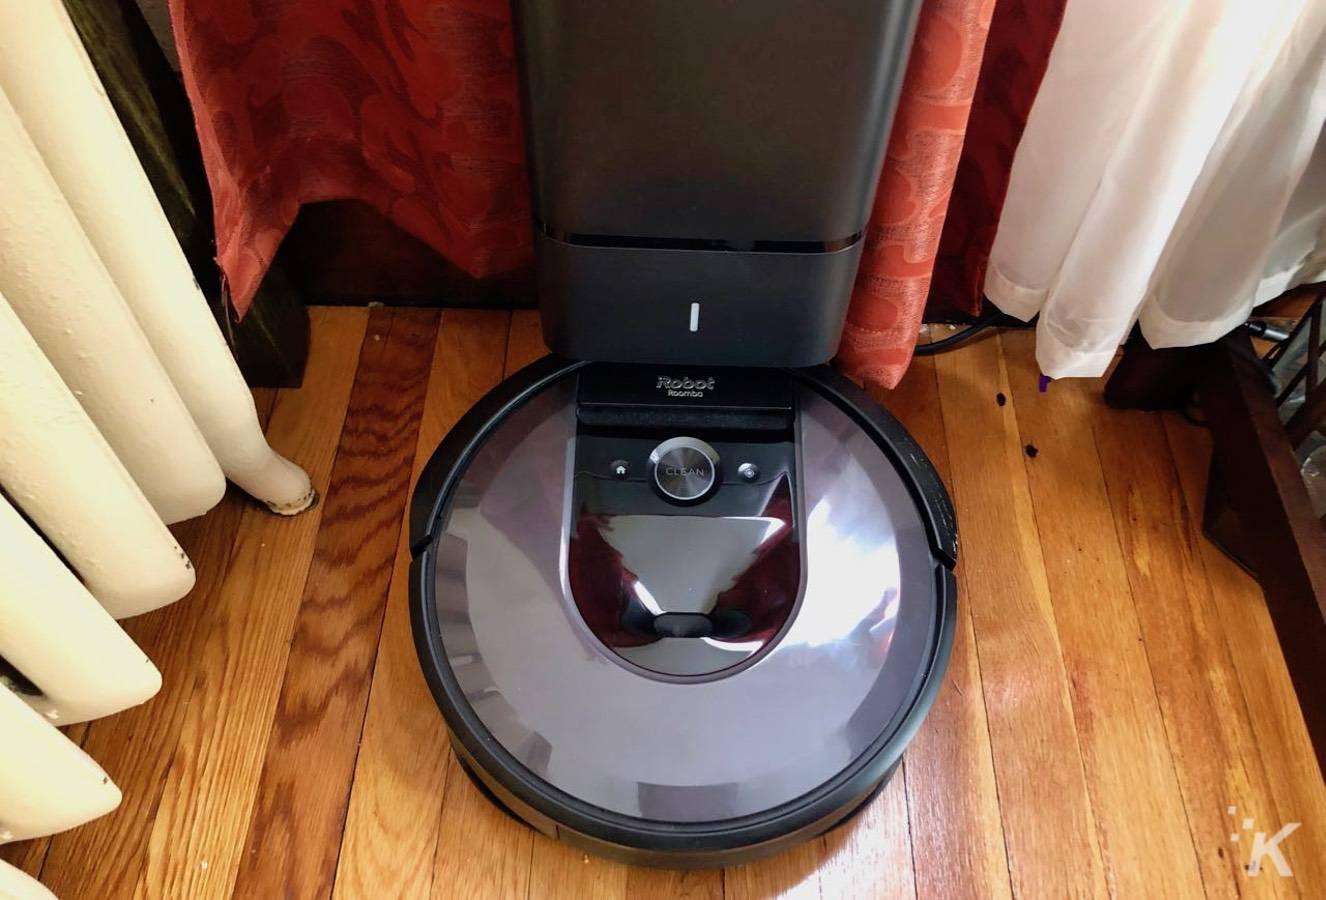 irobot roomba i7+ sitting on charger clean base hardwood floors